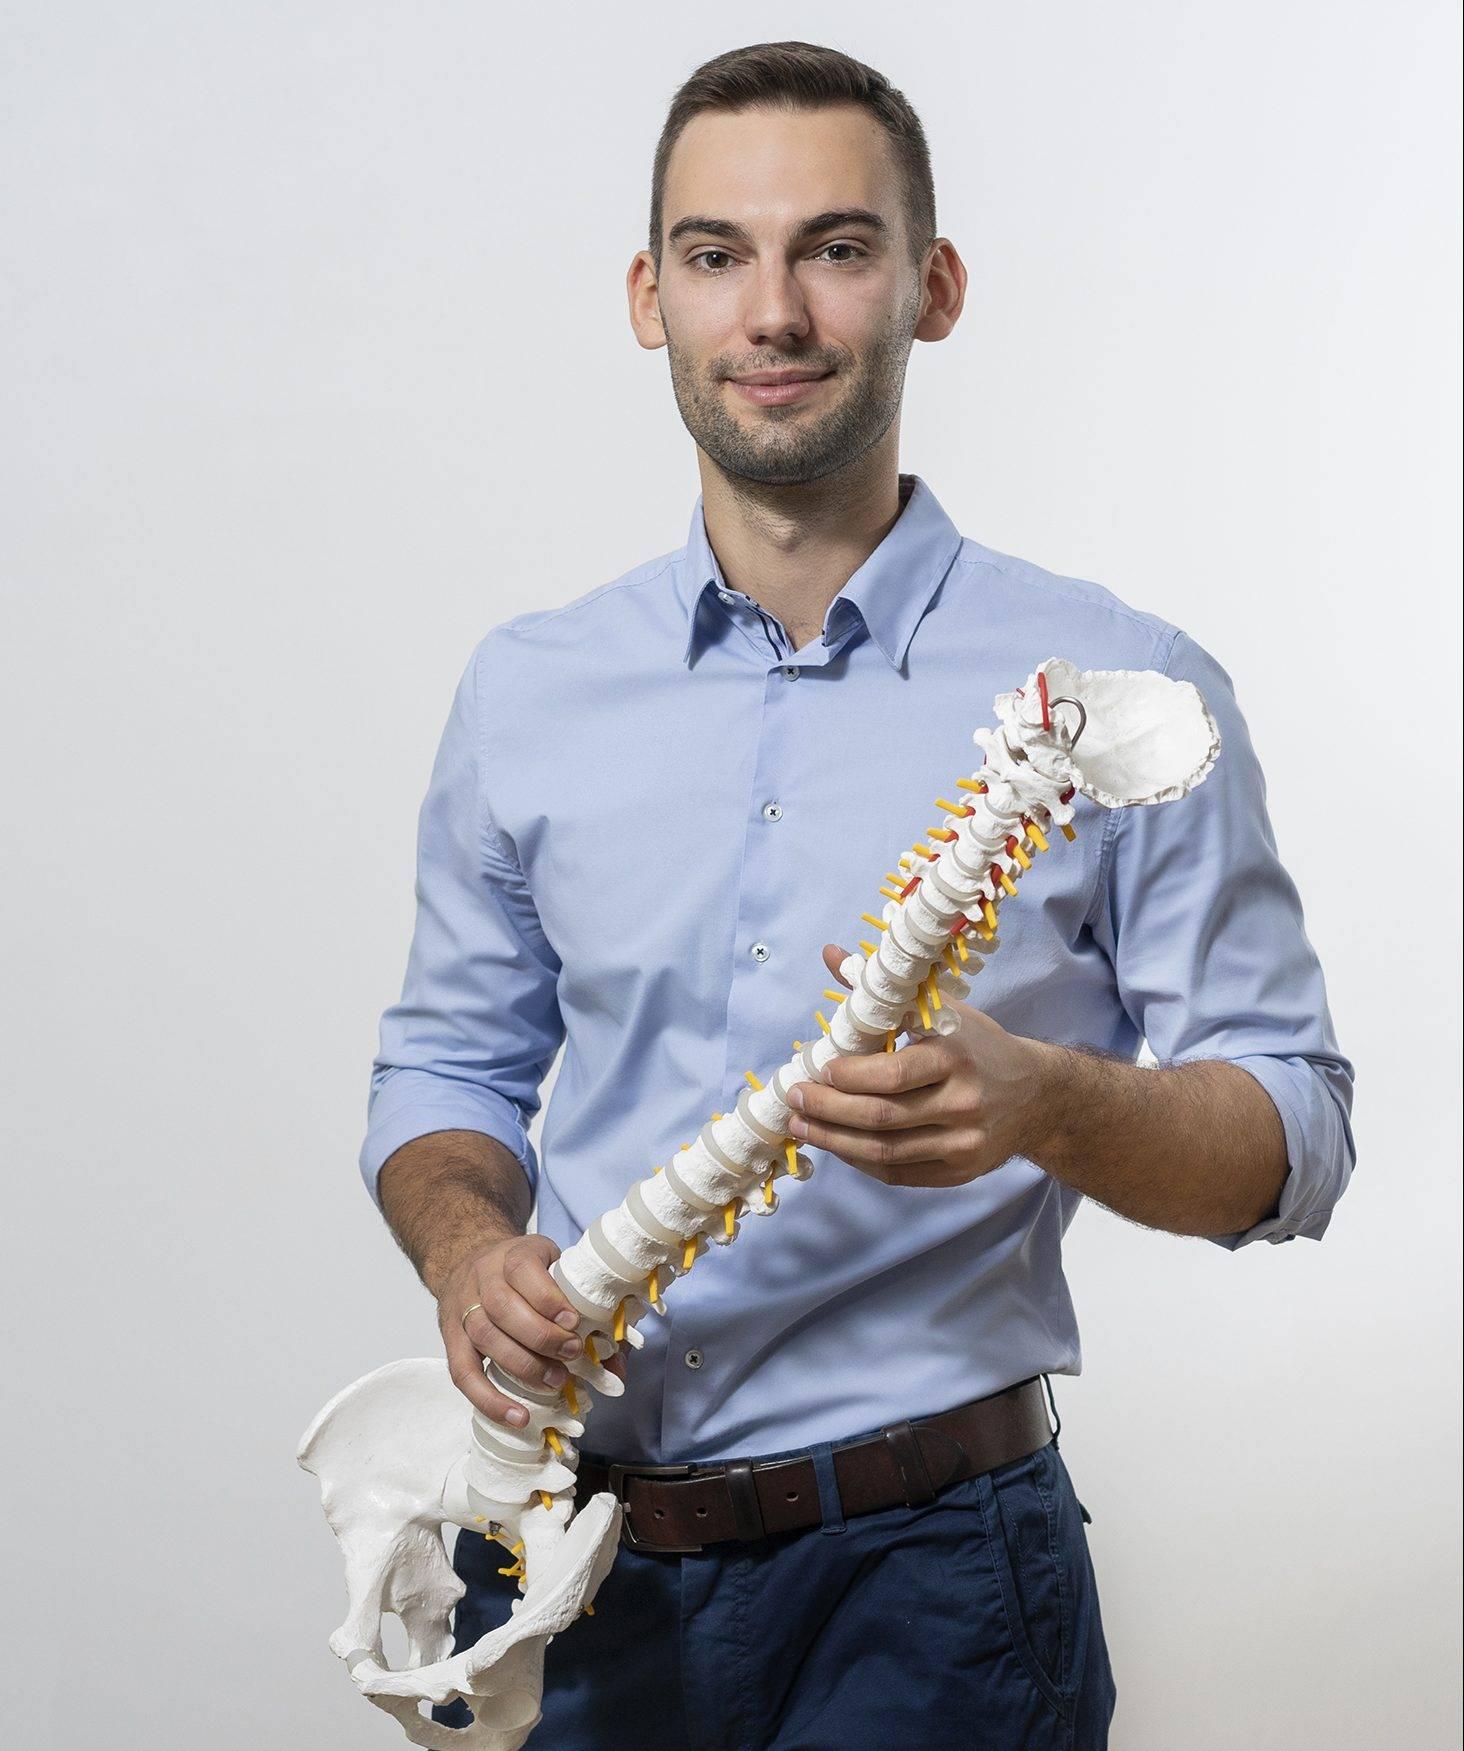 Hubert Pawlin - fizjoterapeuta i trener personalny | Naturalnie o Zdrowiu